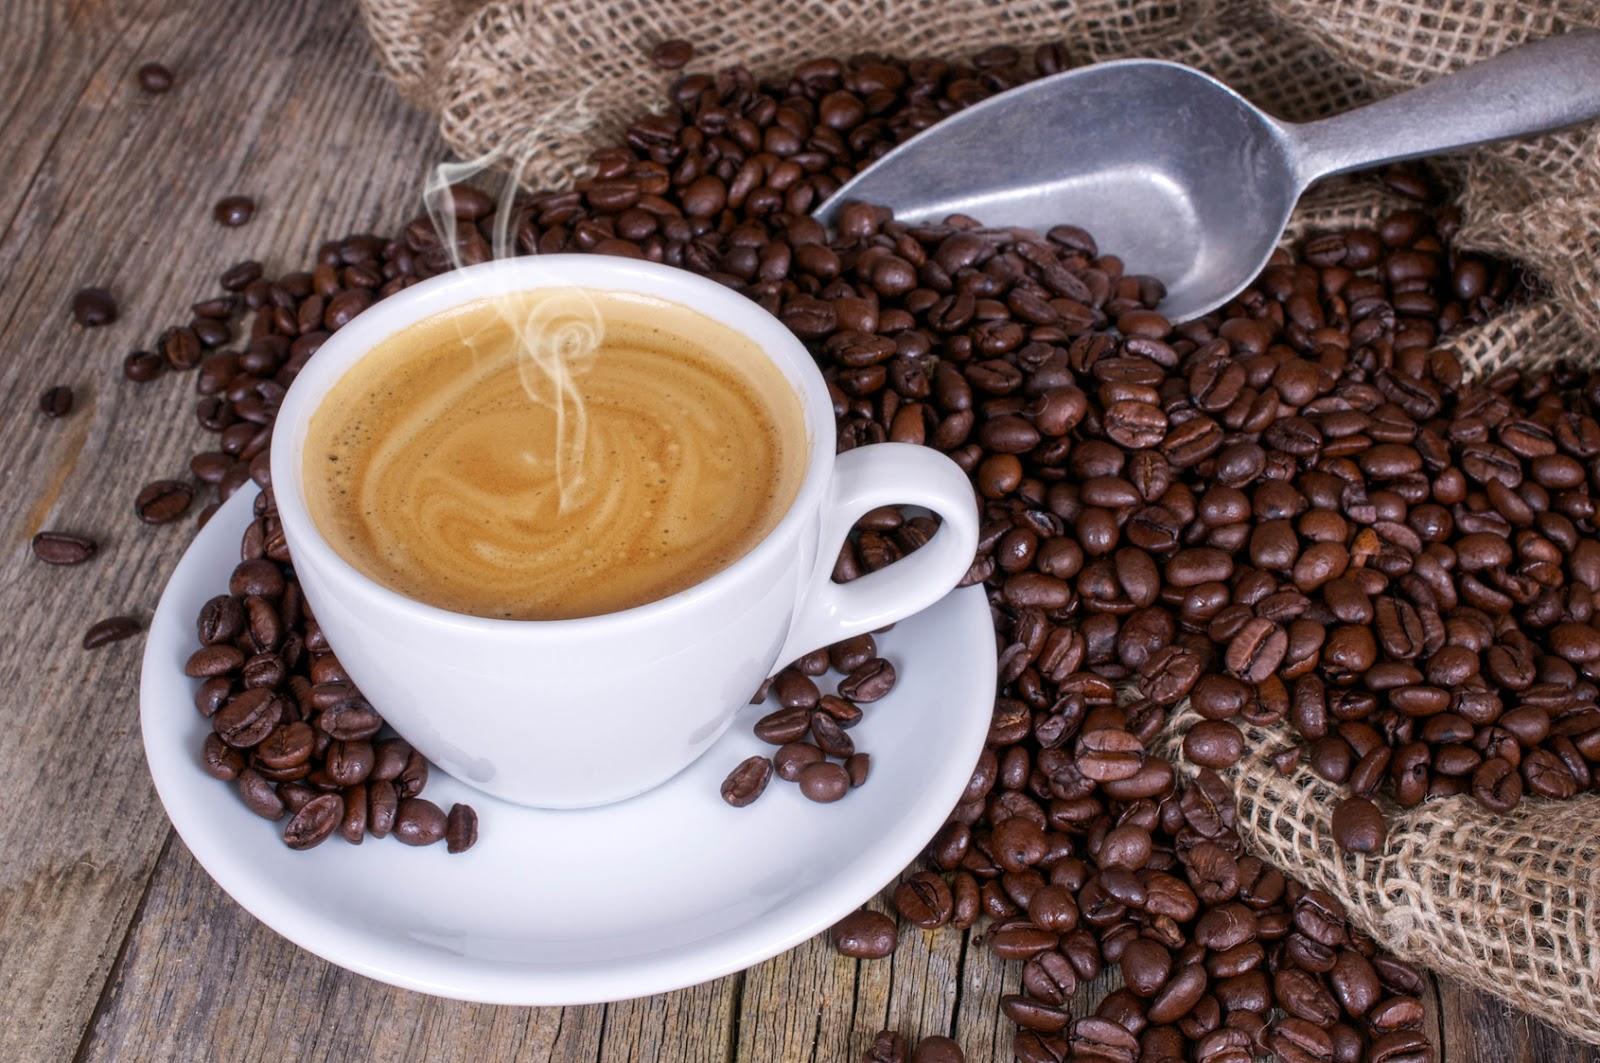 caffe' , coffee.jpg